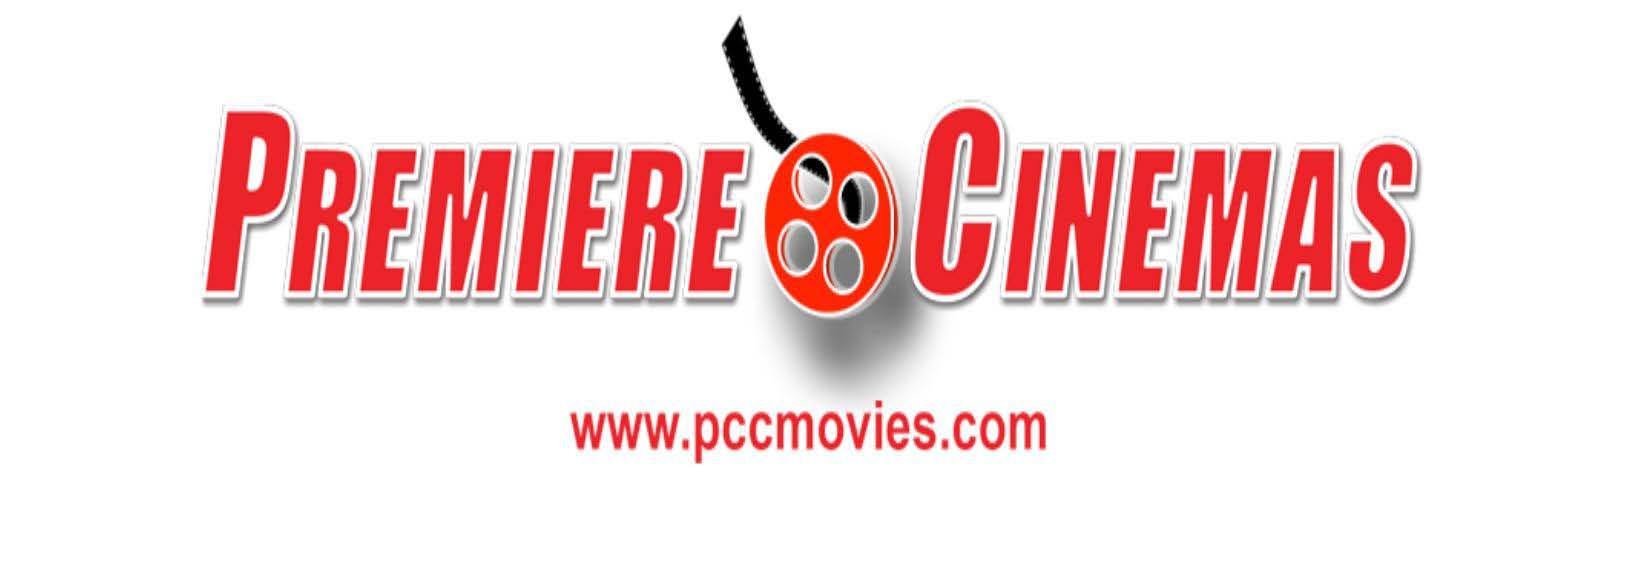 premiere-cinema-14-burleson-tx